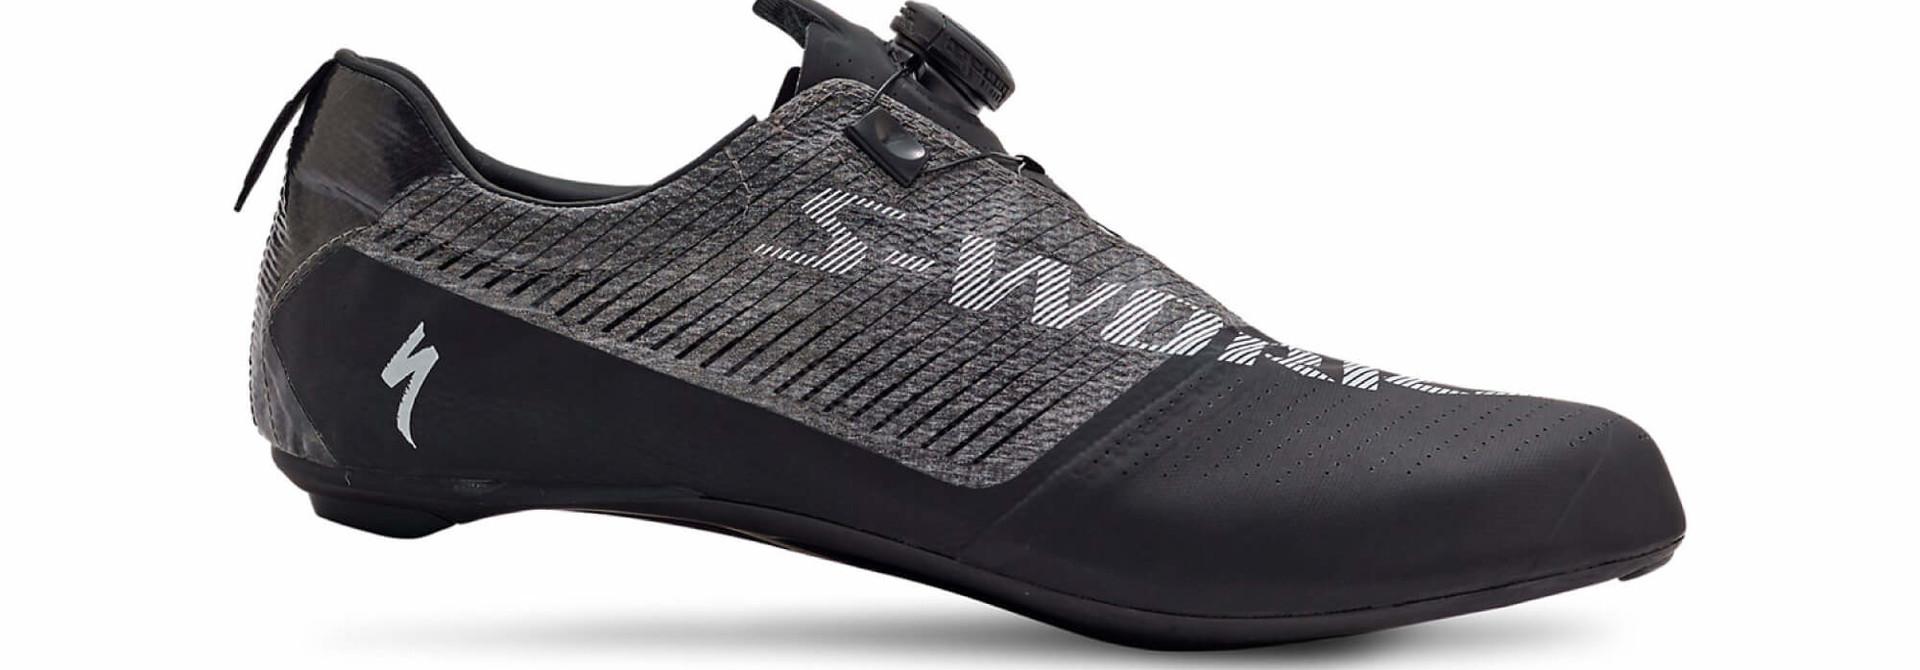 S-Works EXOS Road Shoe